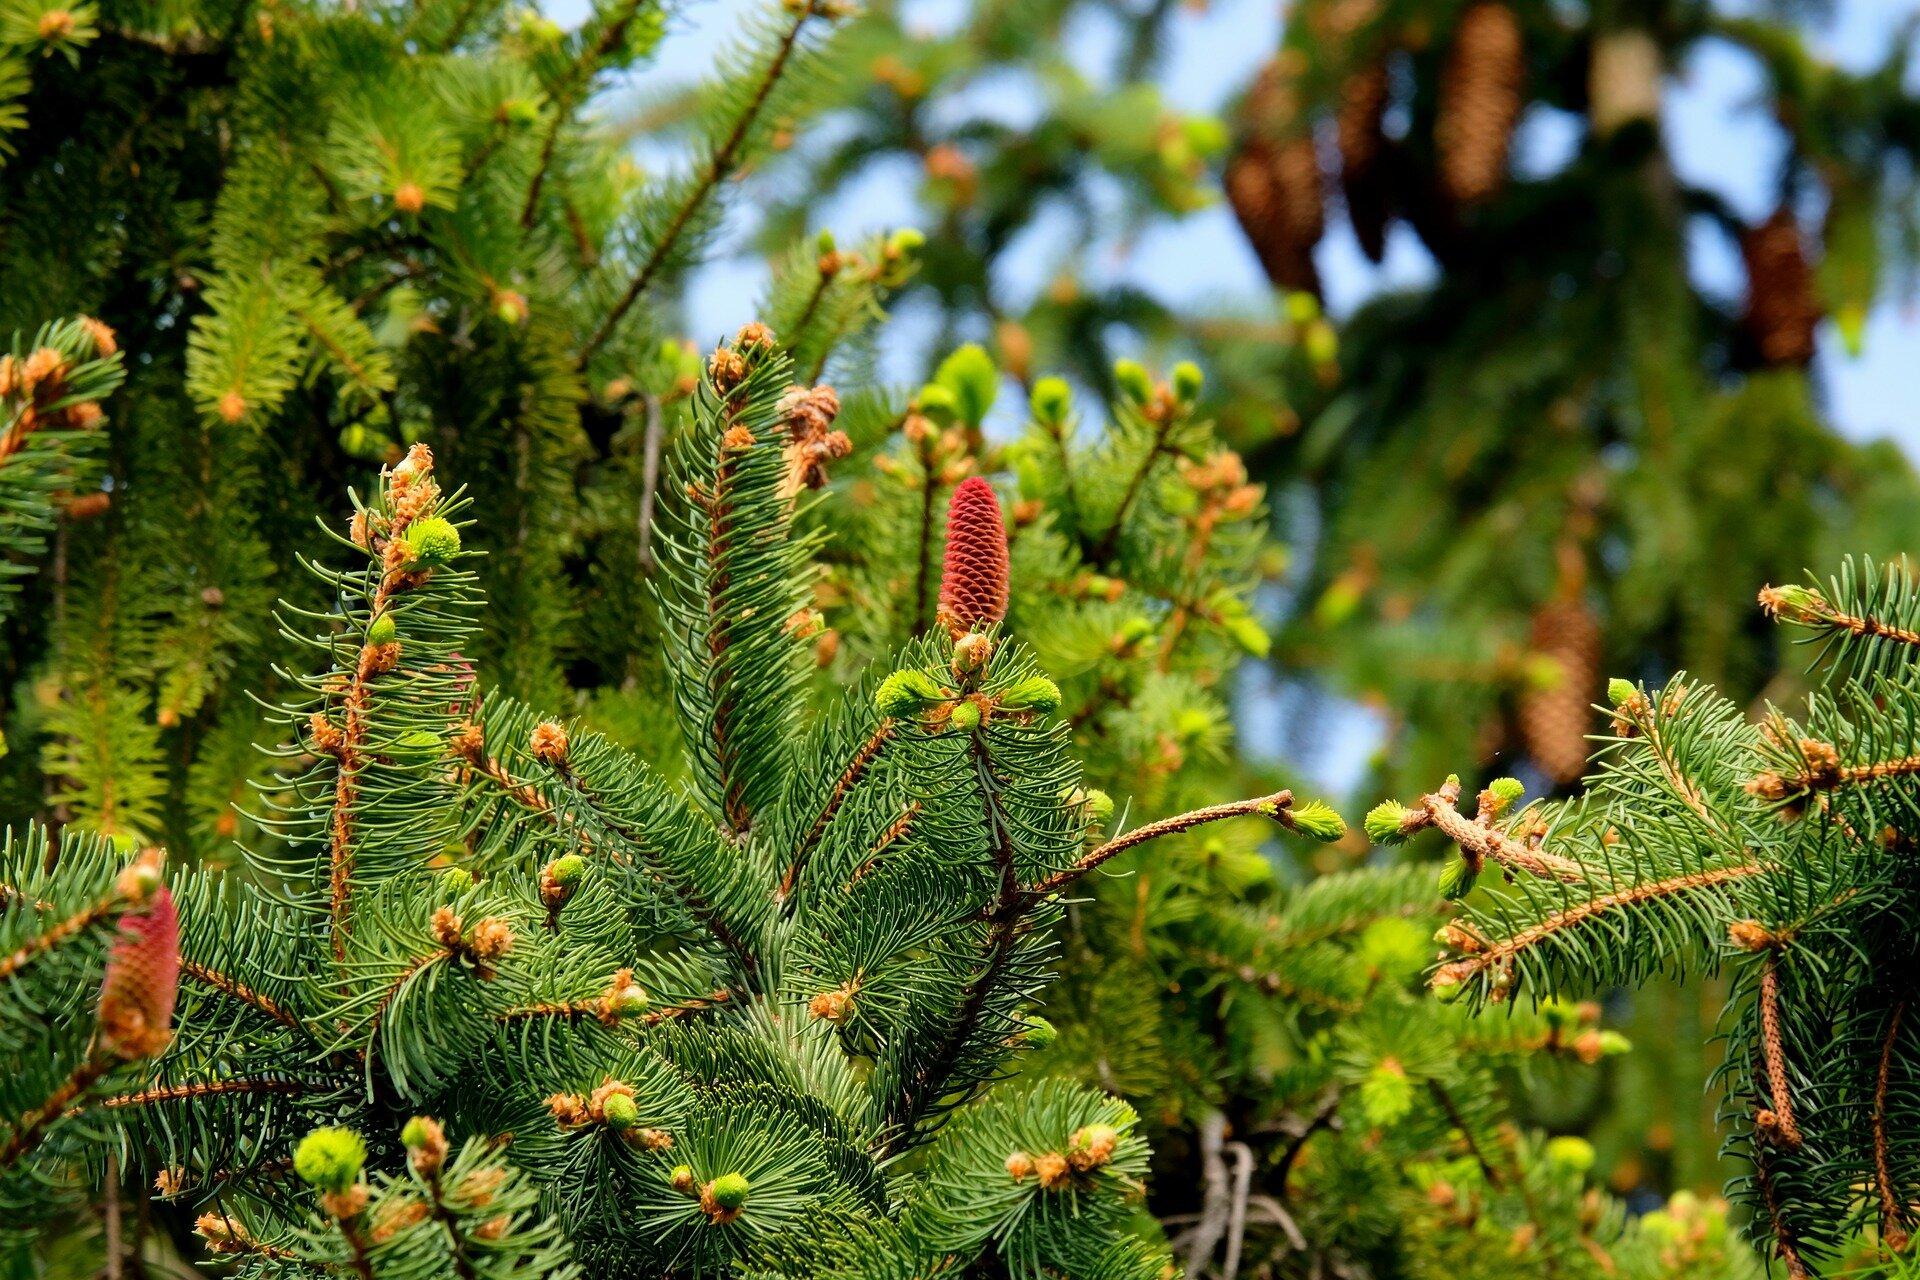 fir-tree-2288229_1920.jpg